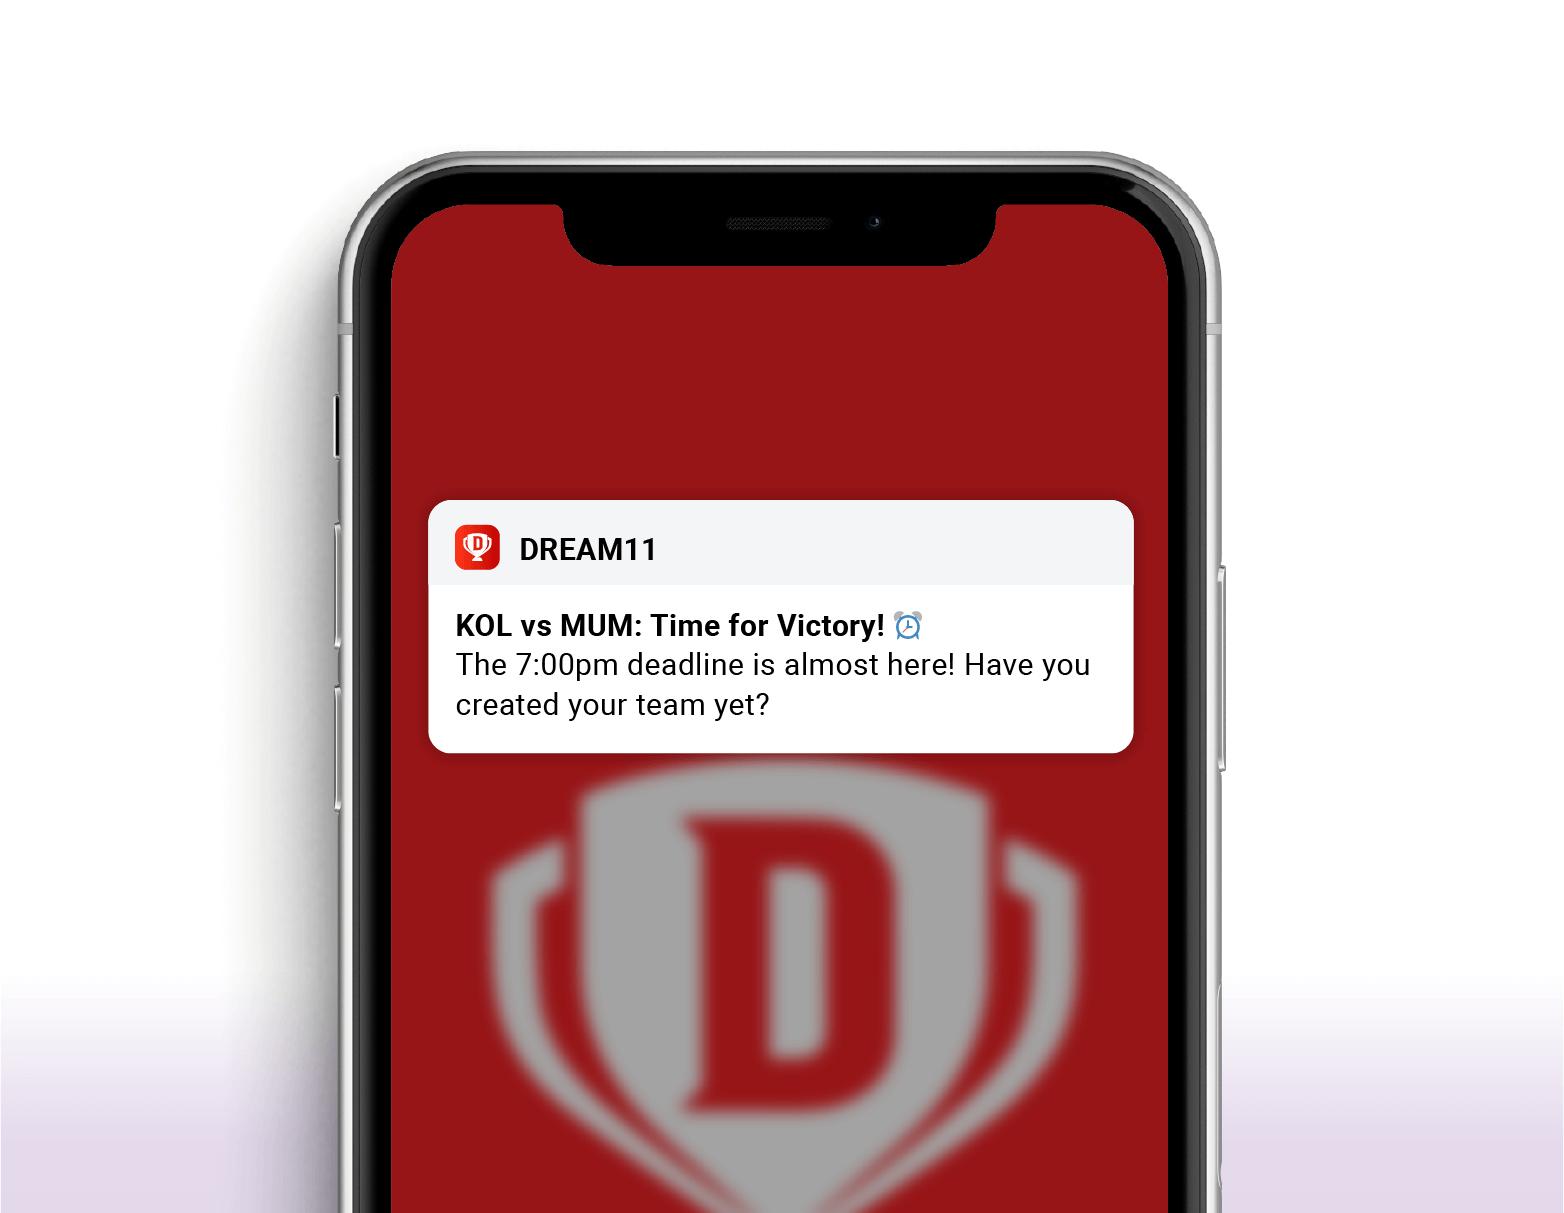 dream 11- reminder campaign